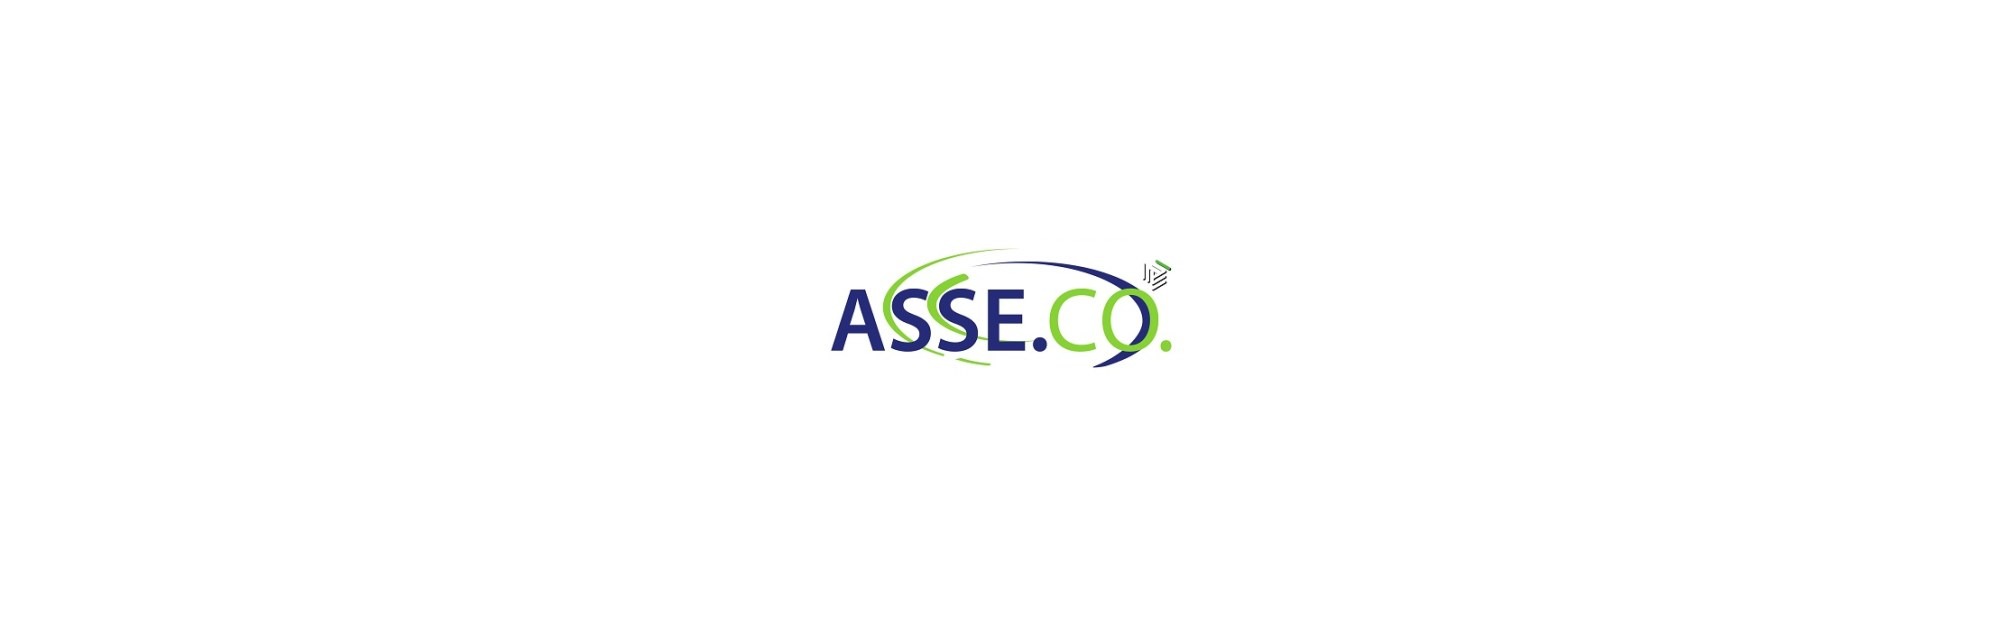 AsseCo - logo